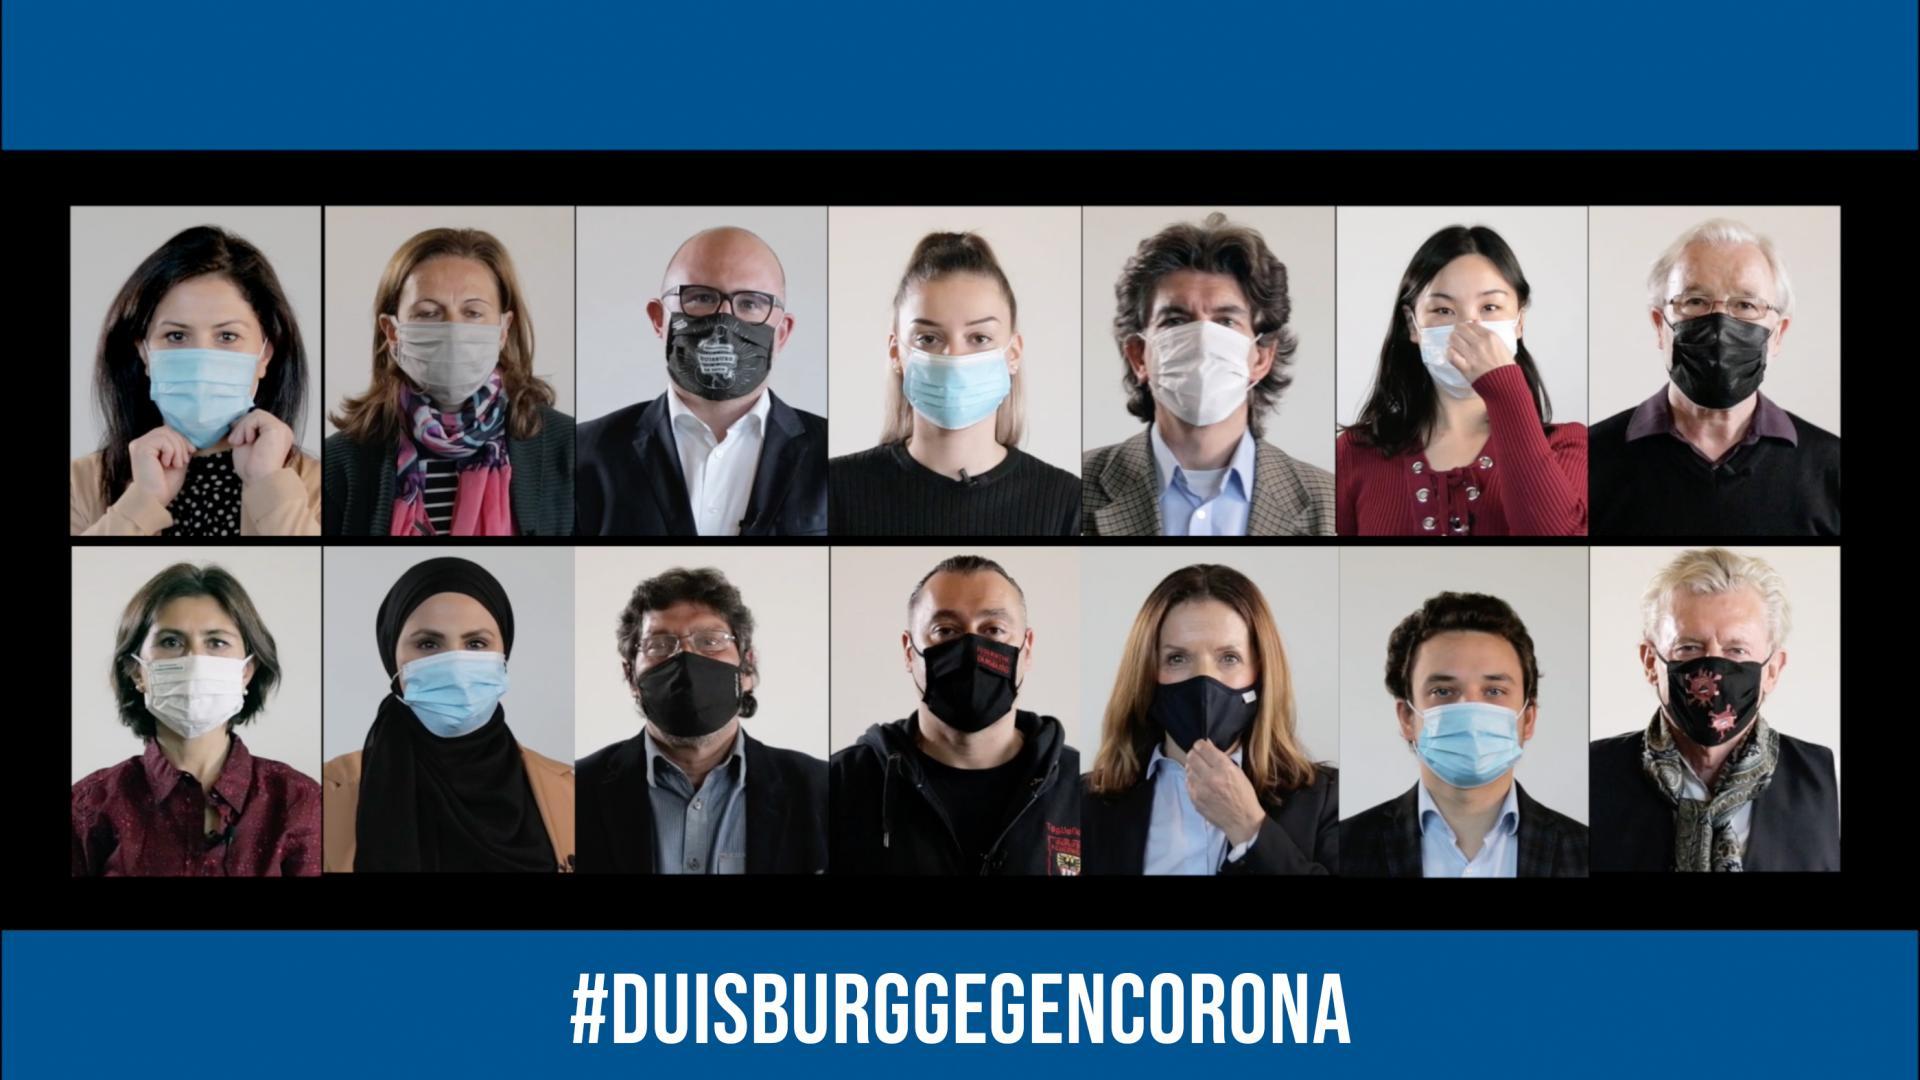 Duisburg-gegen-Corona